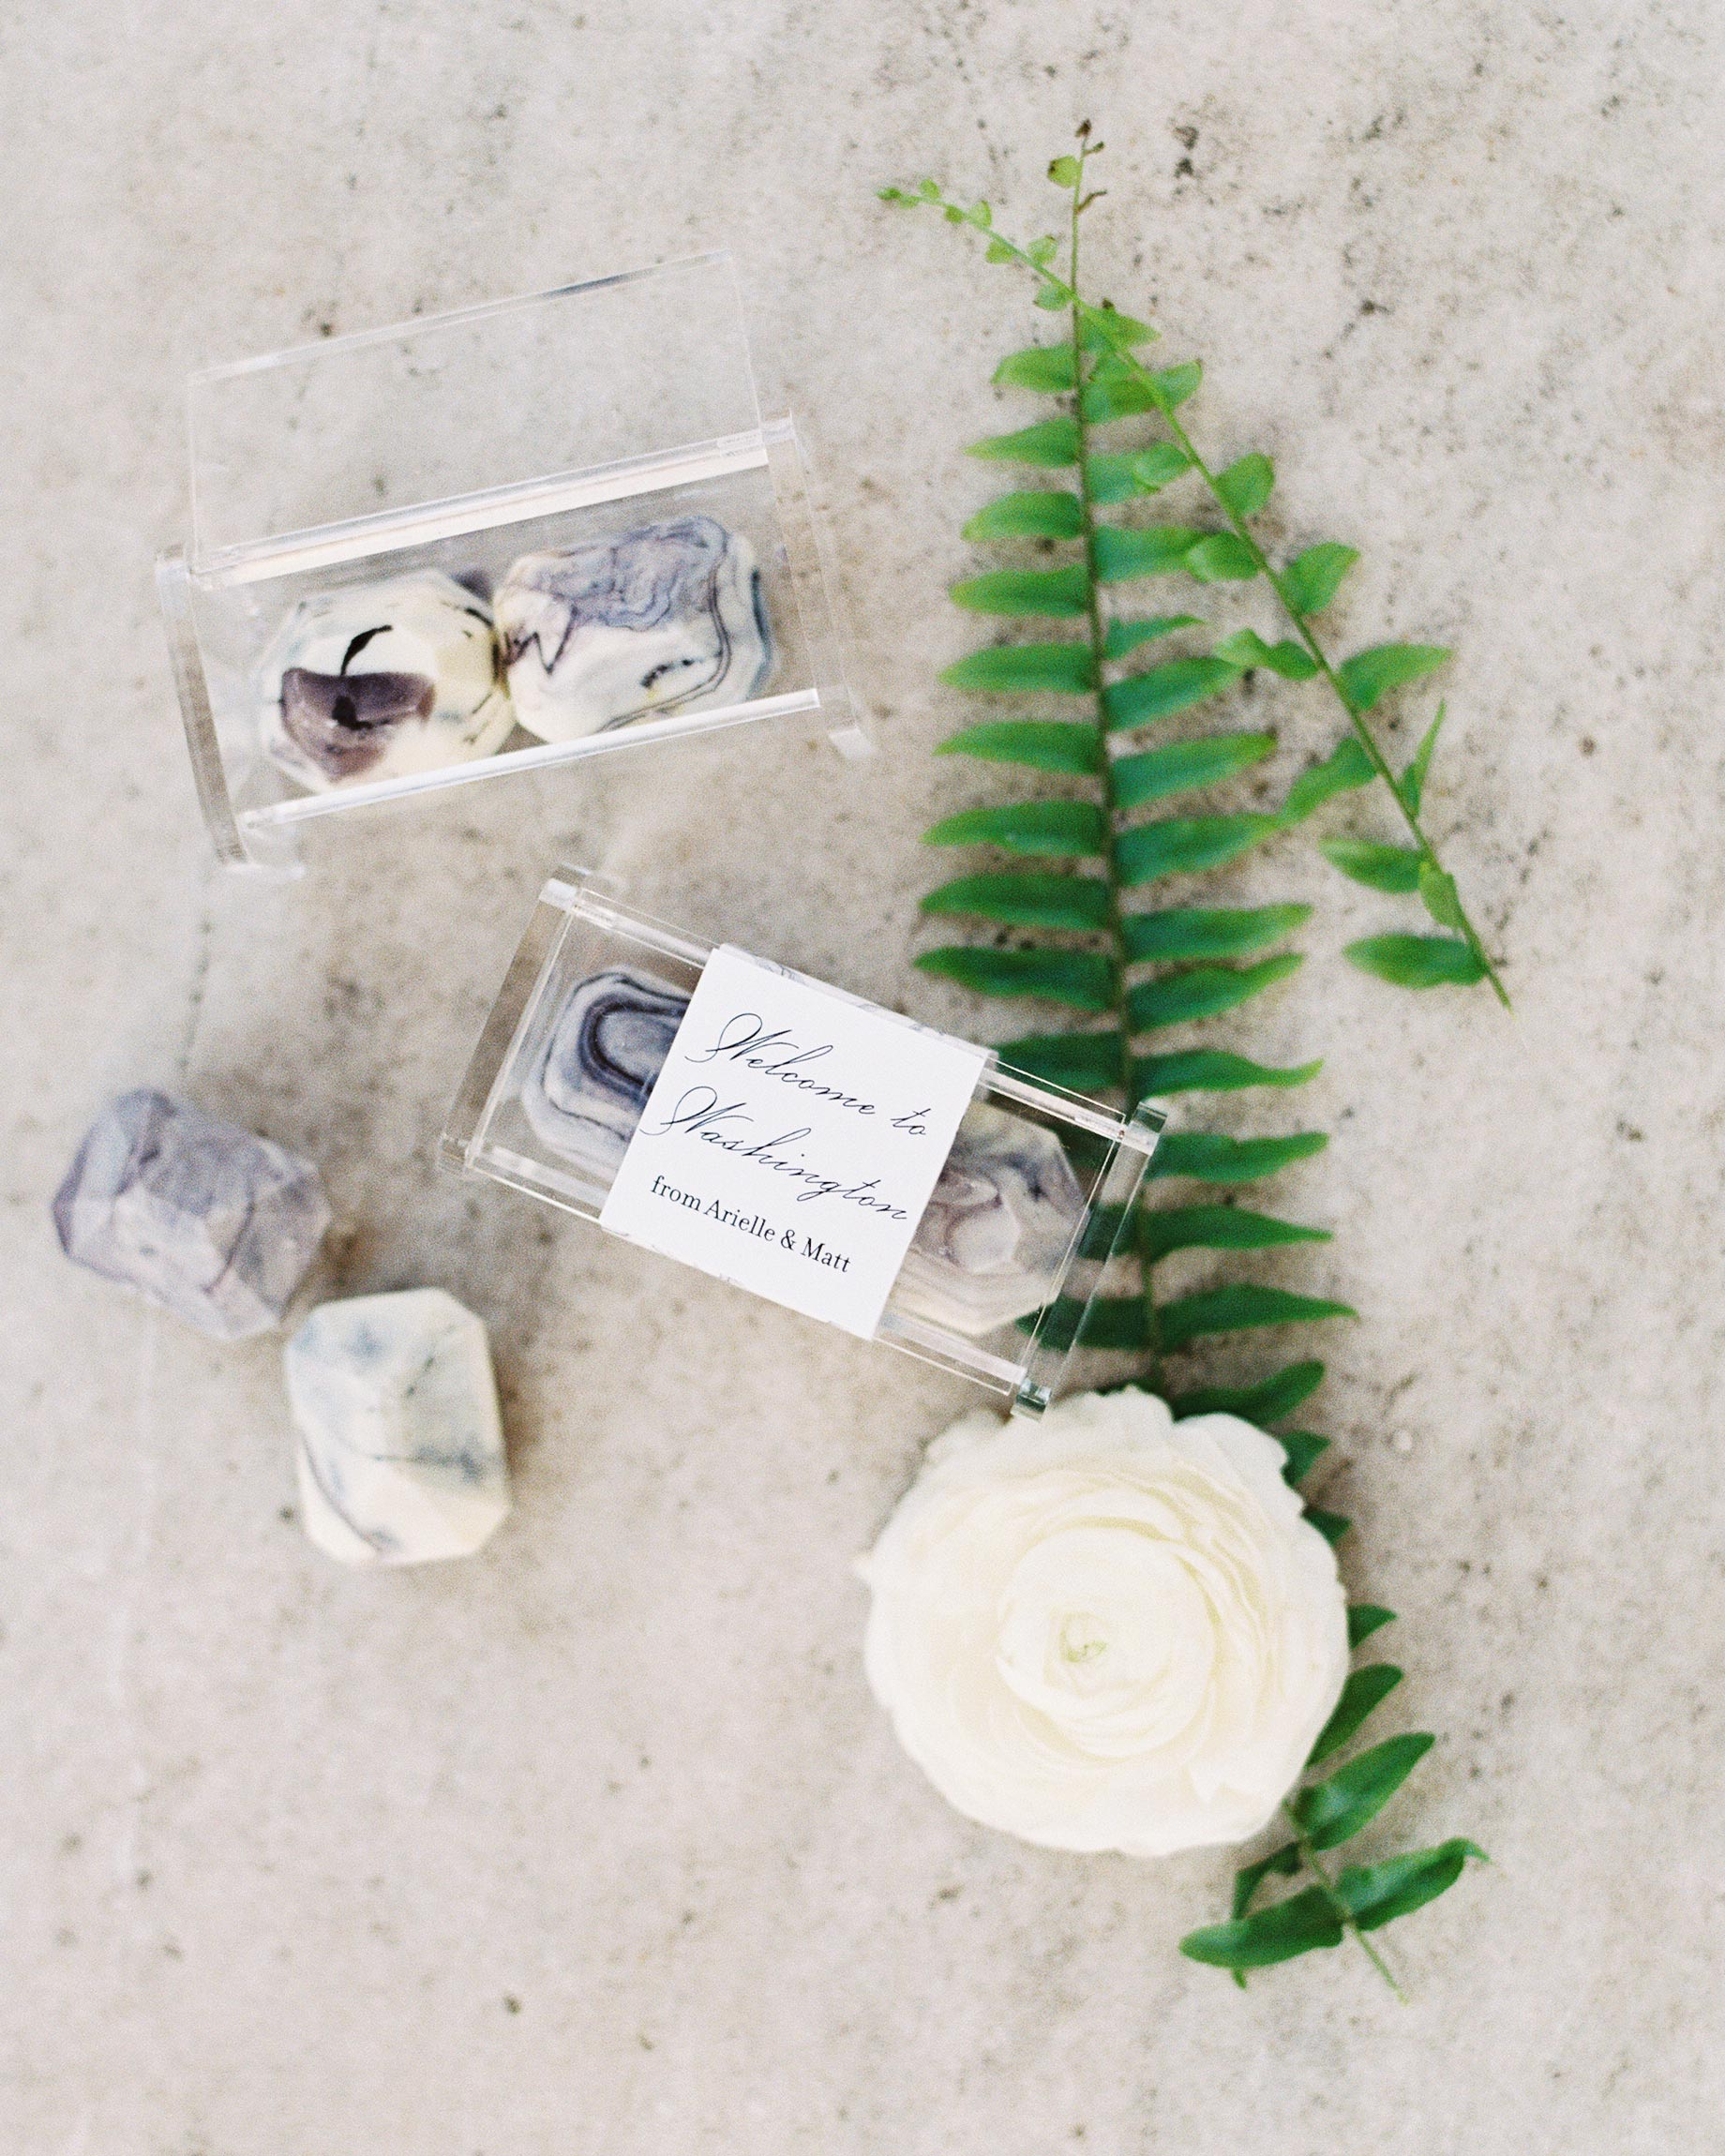 arielle-matt-wedding-chocolates-9-6134241-0716.jpg